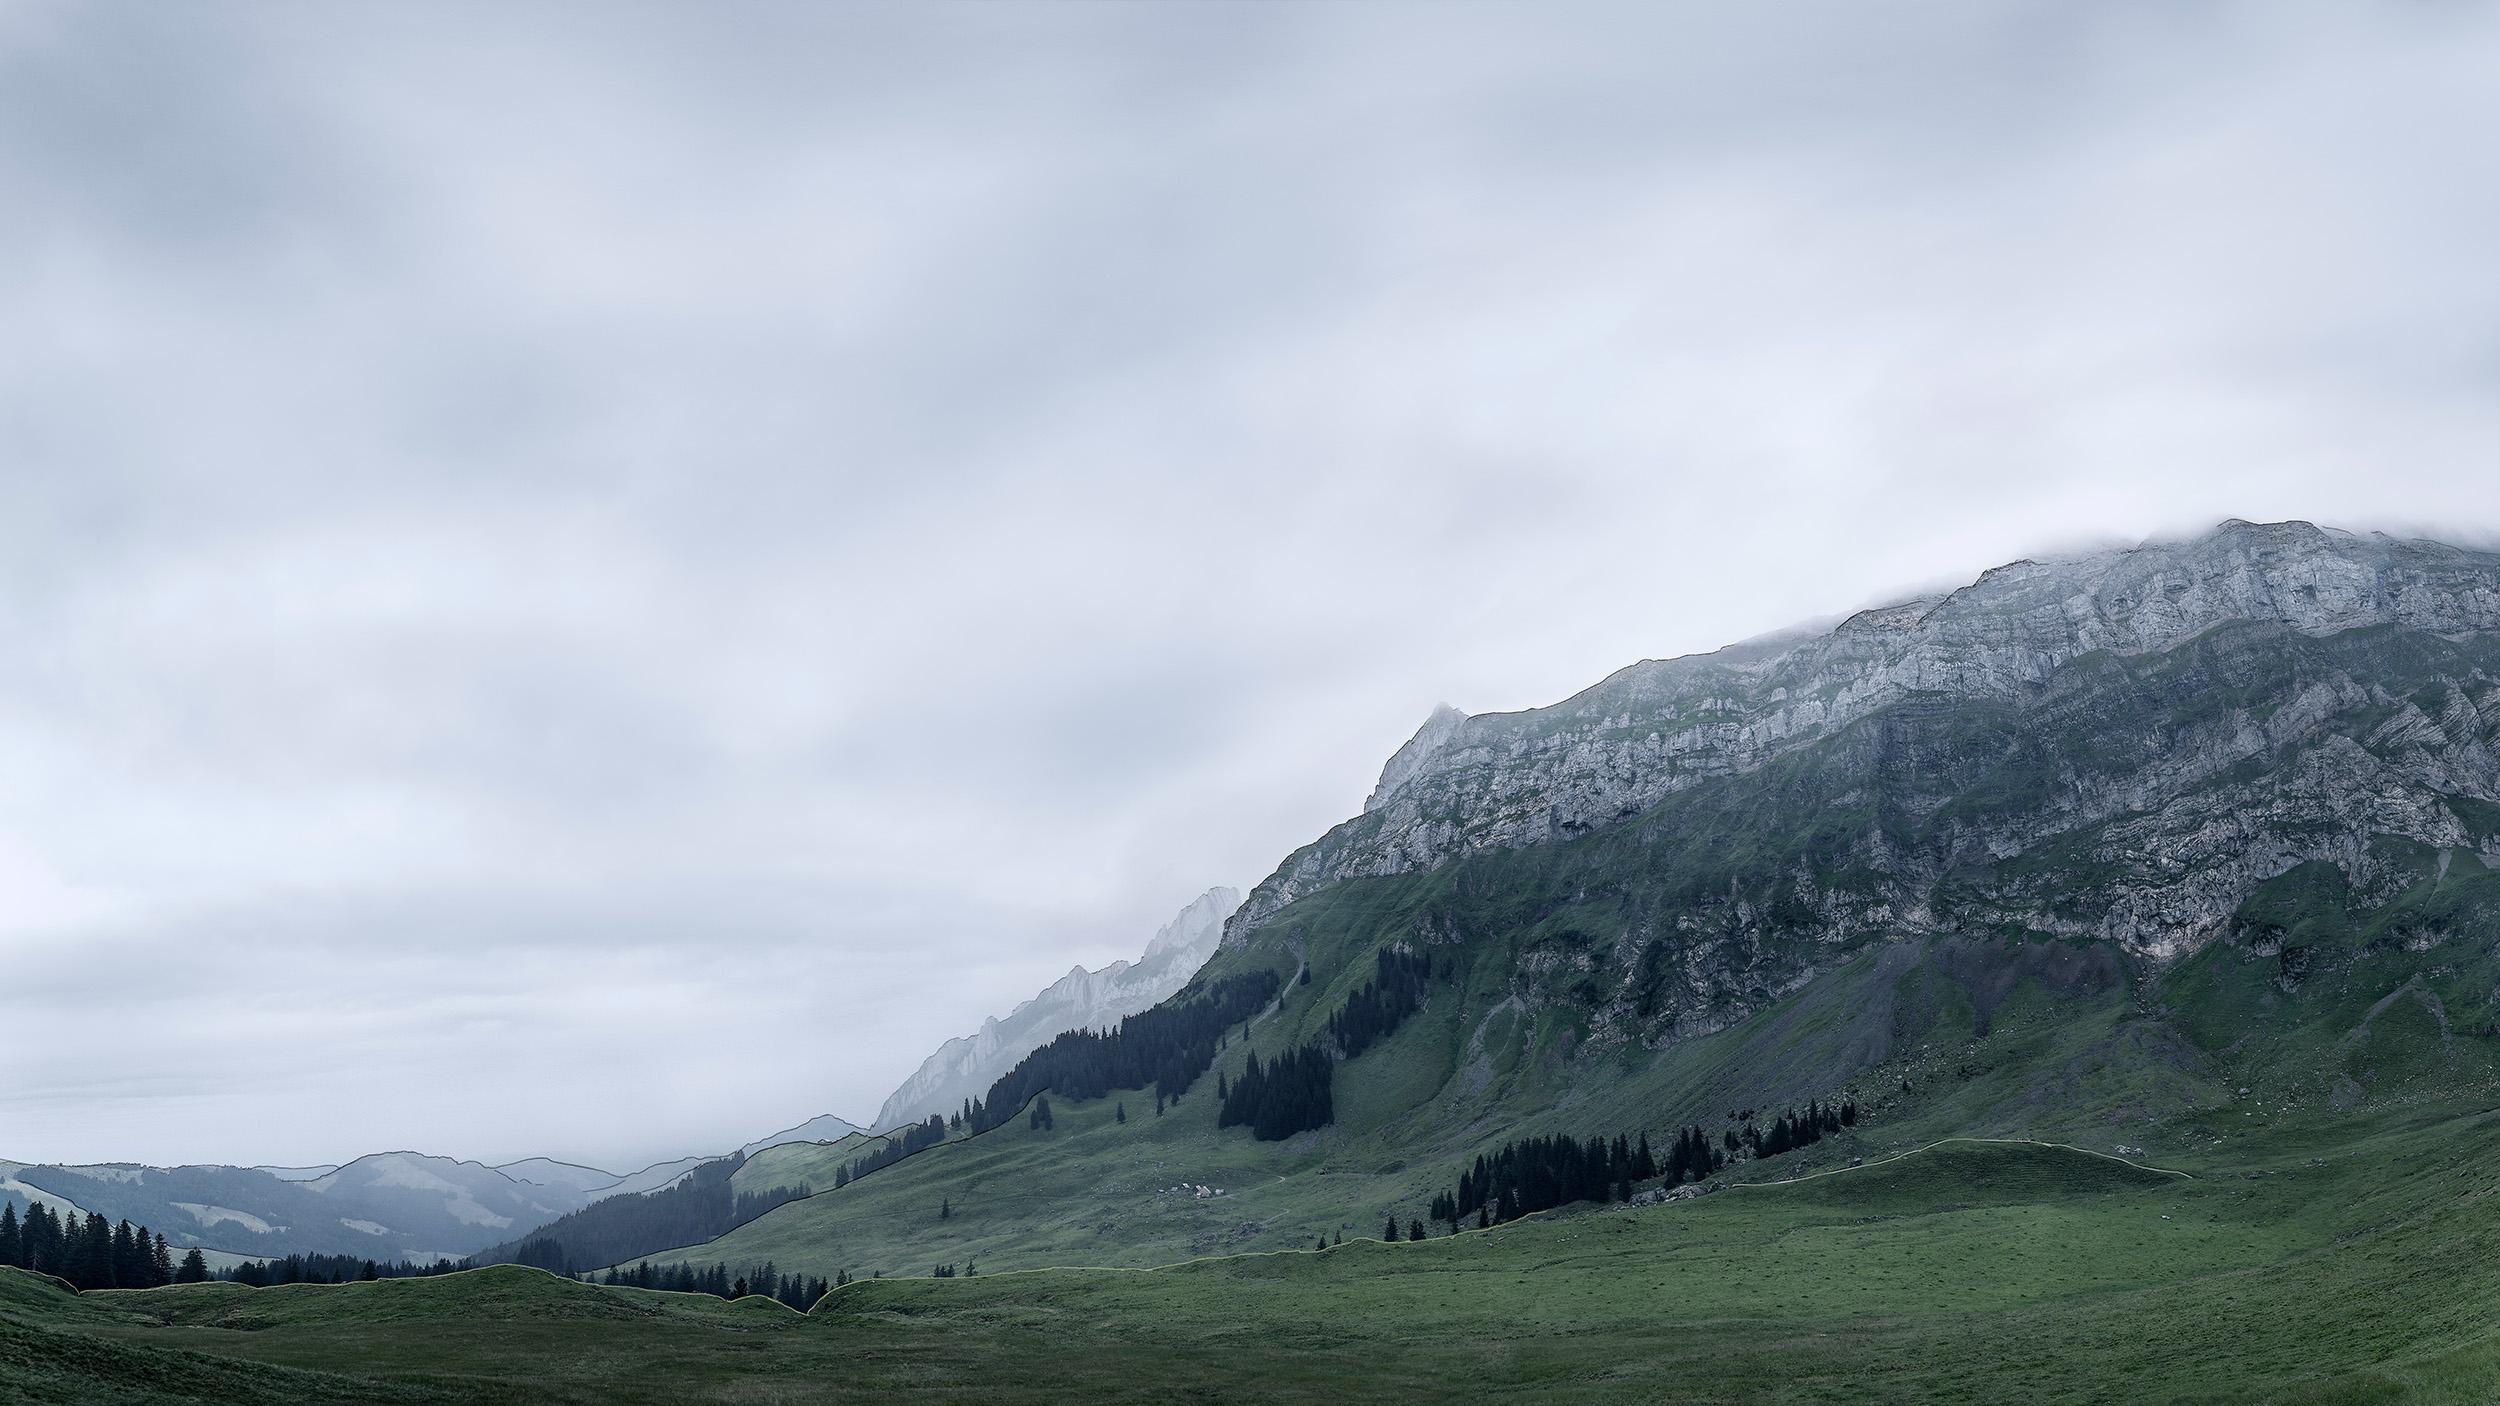 Landschaft | Potersalp, Alpstein, Appenzell, Schweiz